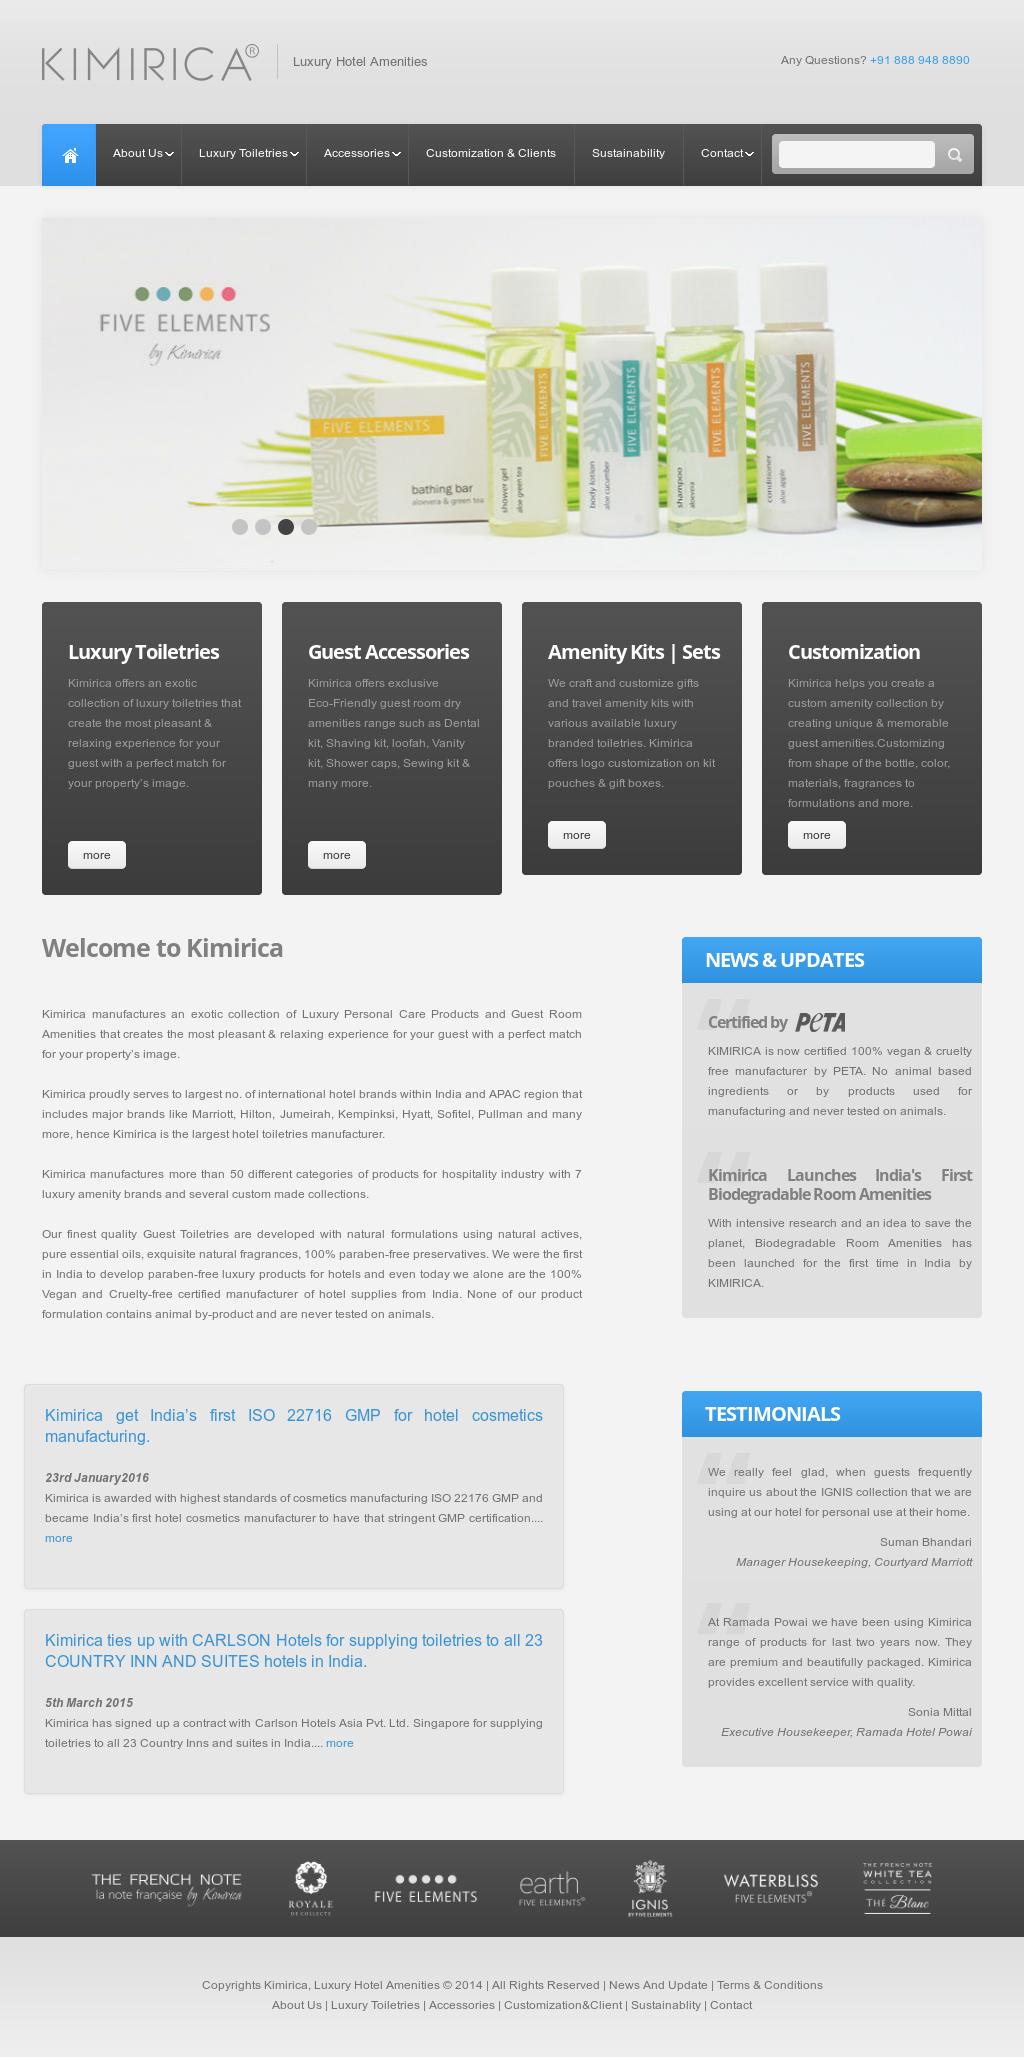 Kimirica Competitors, Revenue and Employees - Owler Company Profile